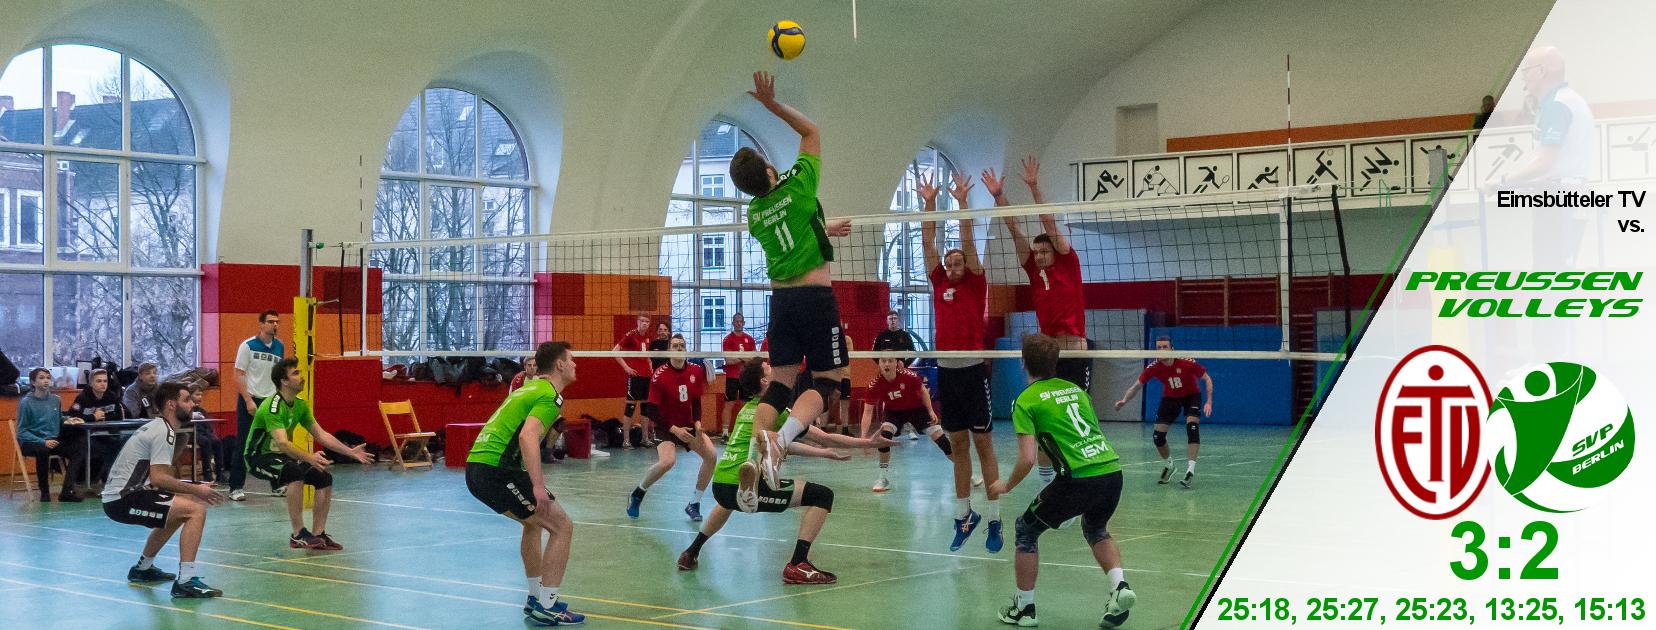 14. Spieltag gegen den Eimsbütteler TV